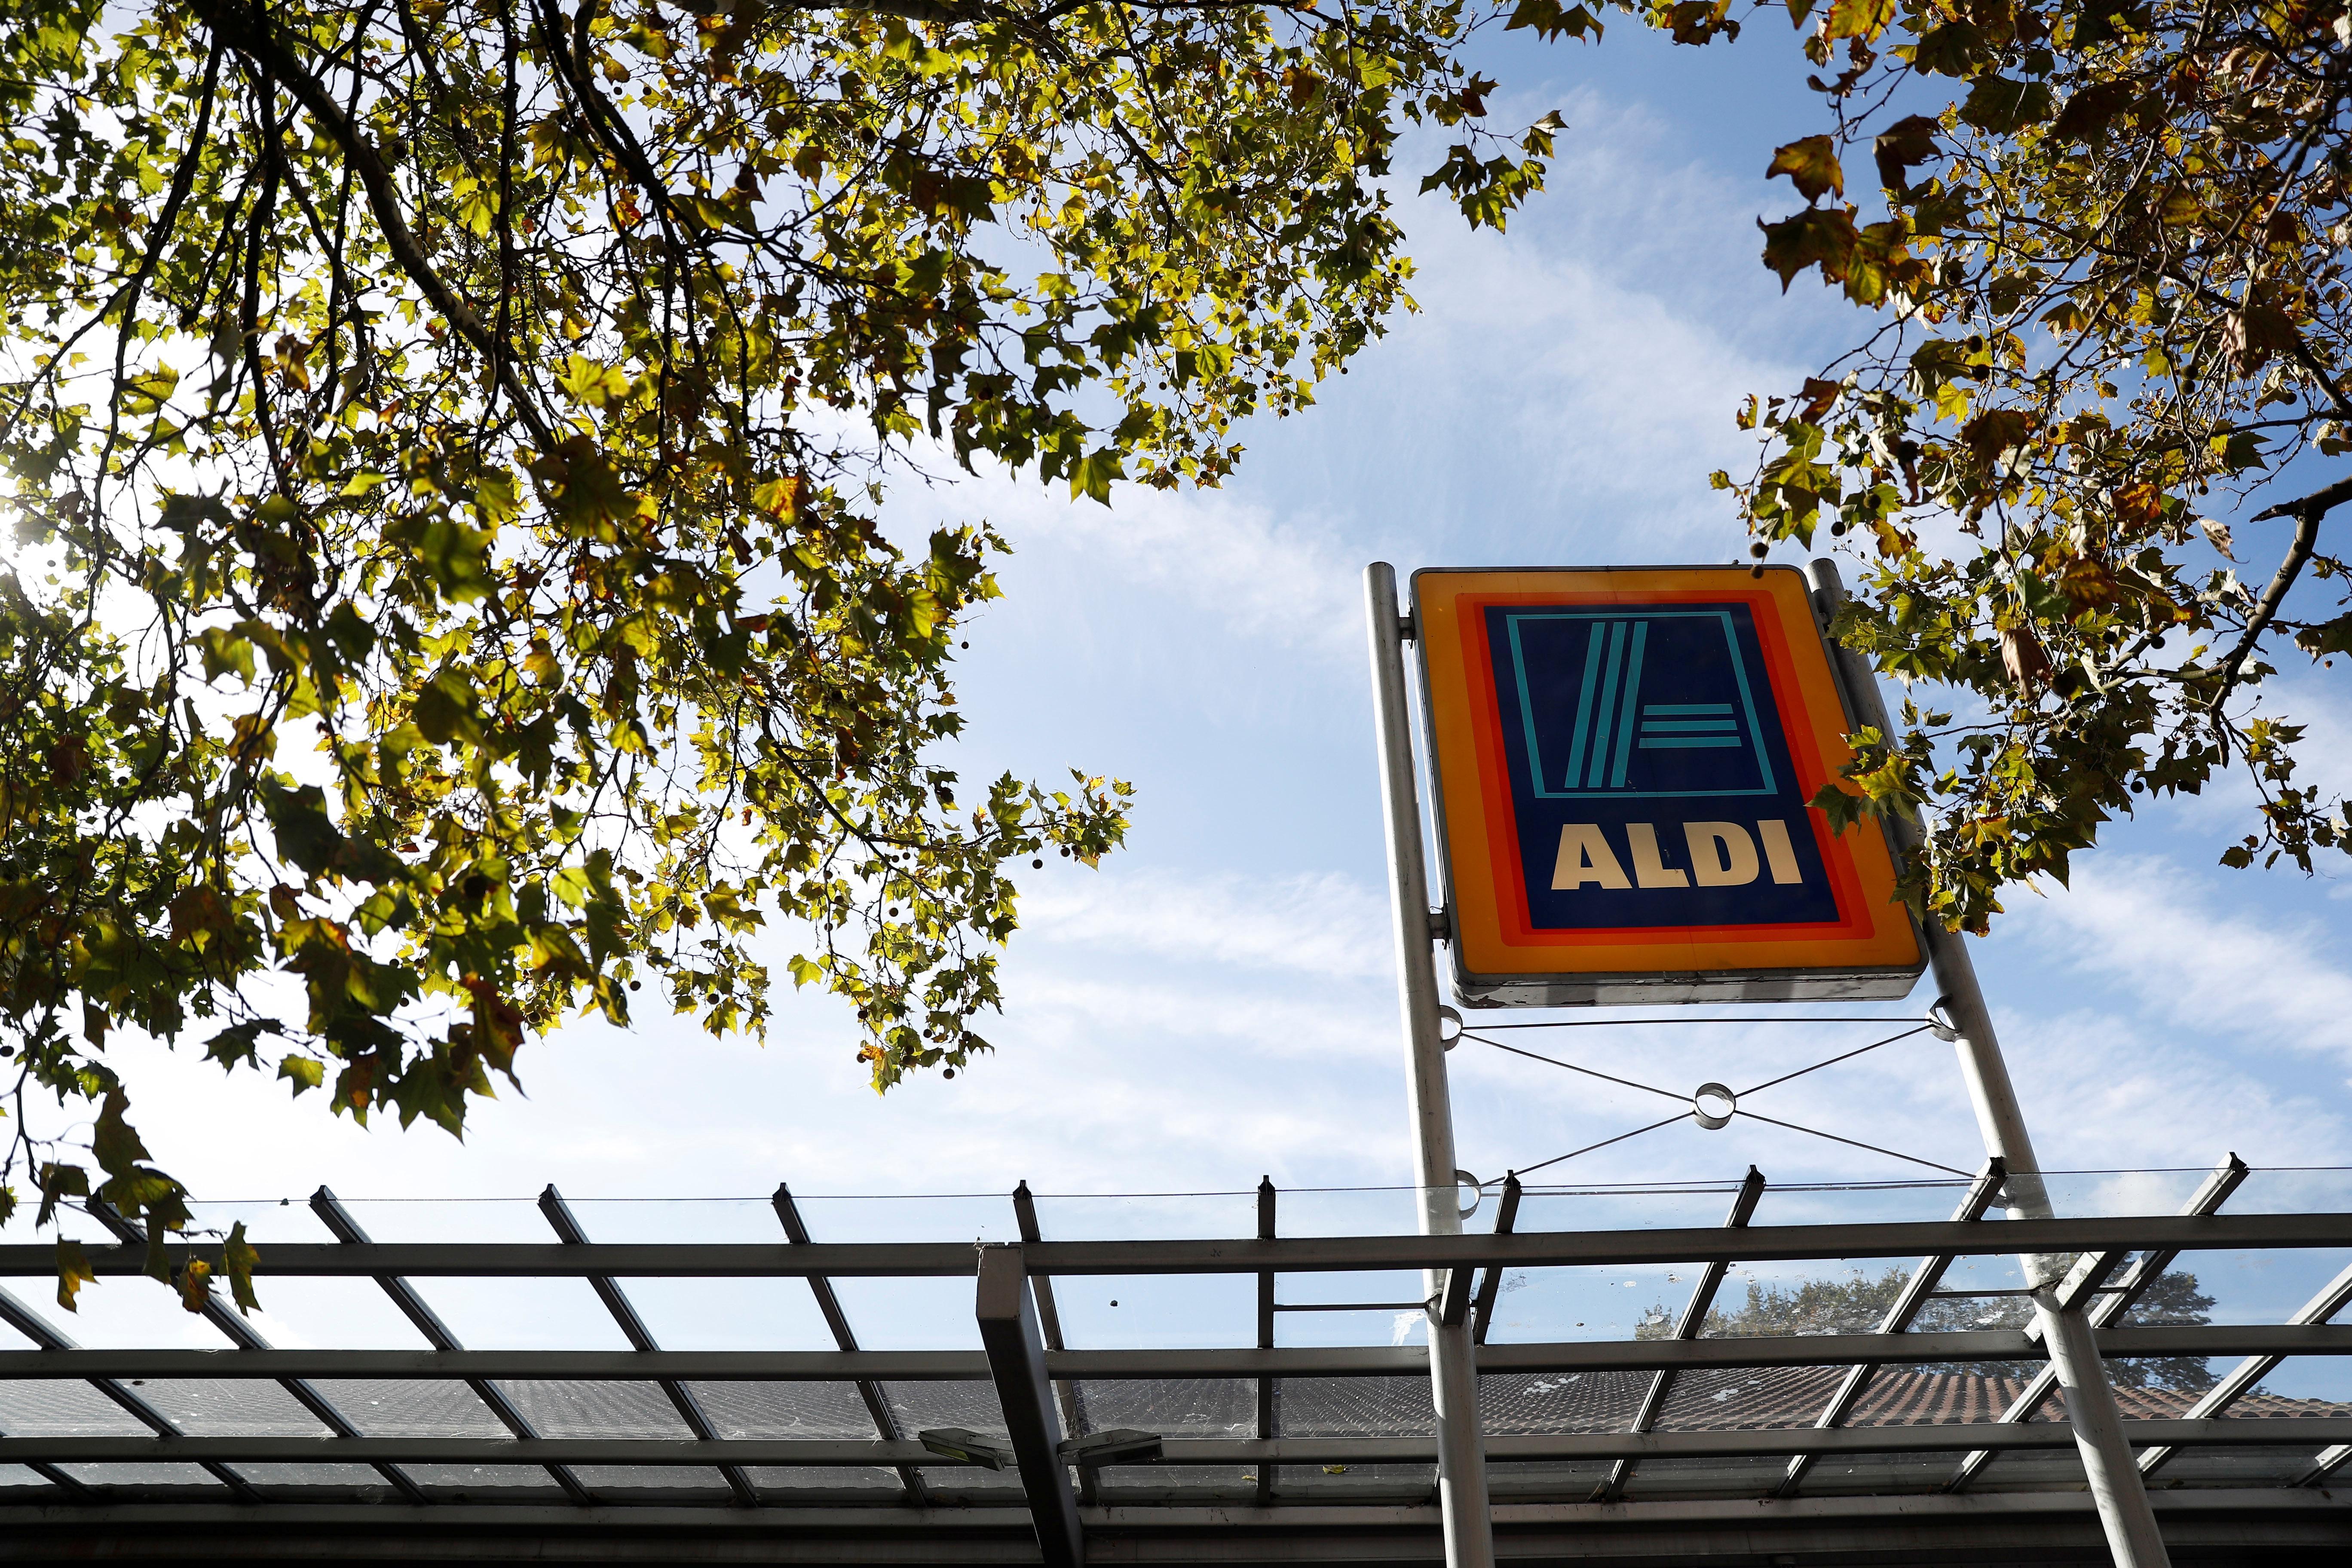 Aldi UK to invest £1 billion as profits fall